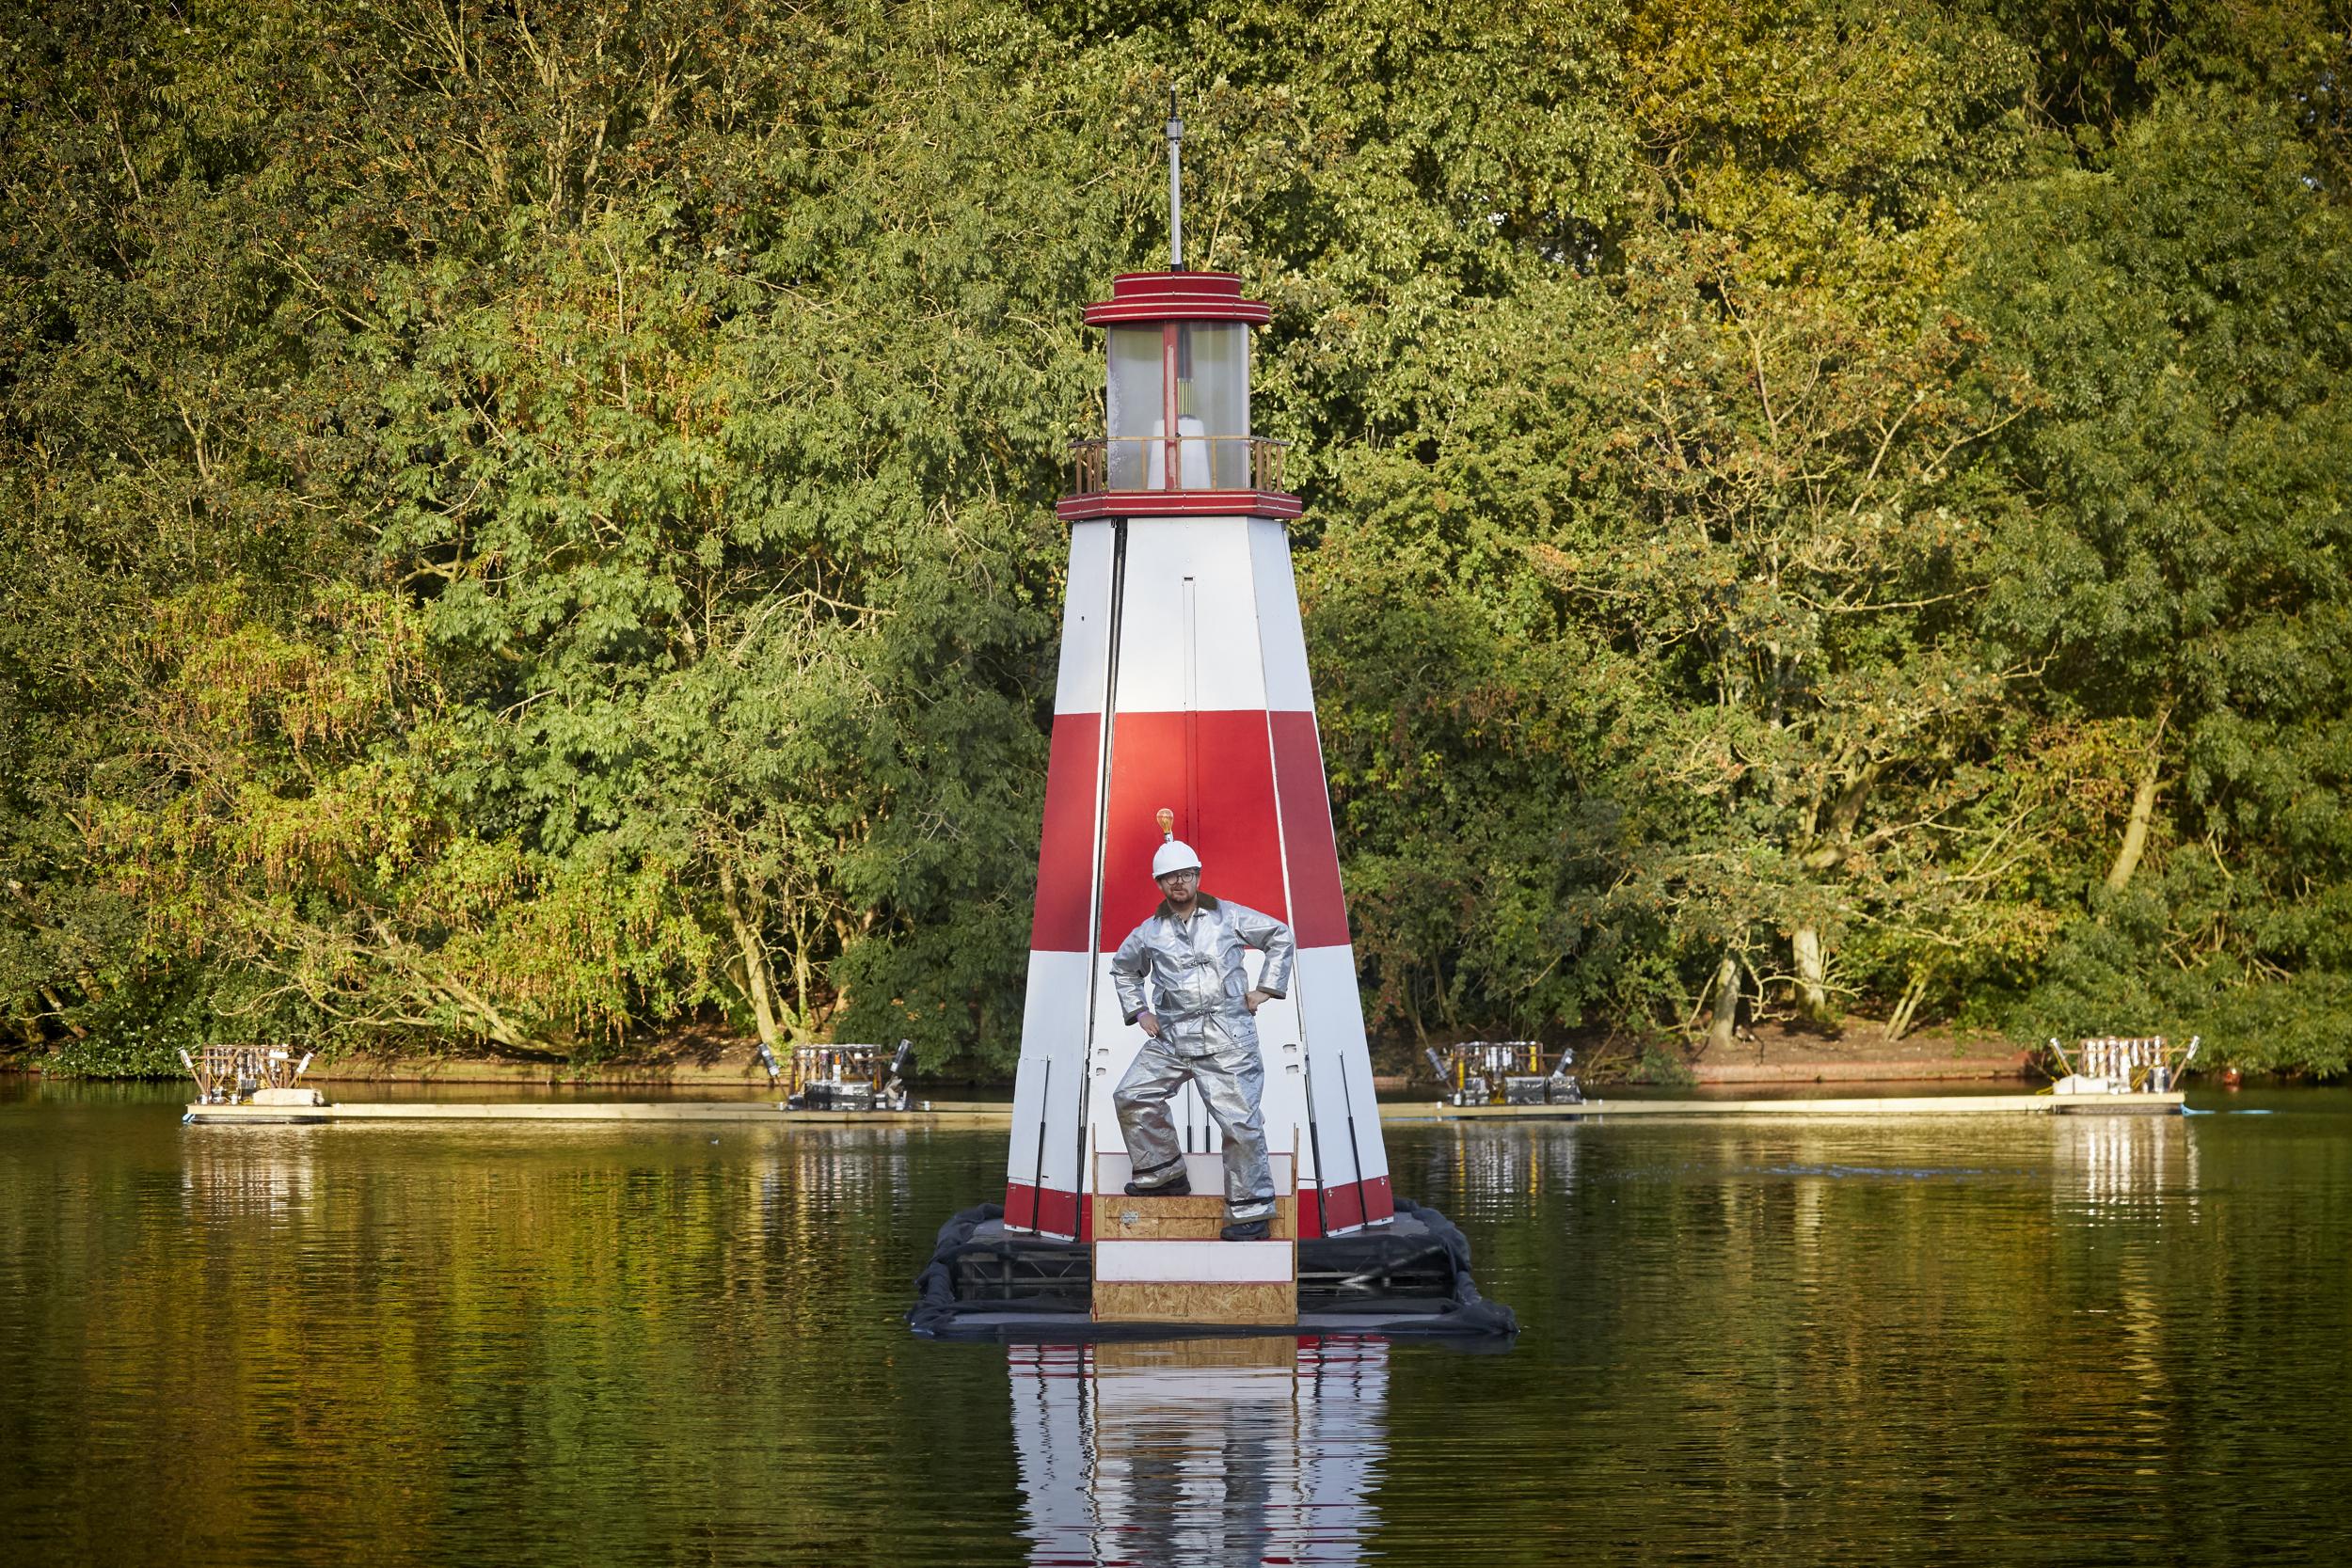 The second annual Festival of Manchester in Platt Fields Park Walk the plank lighthouse